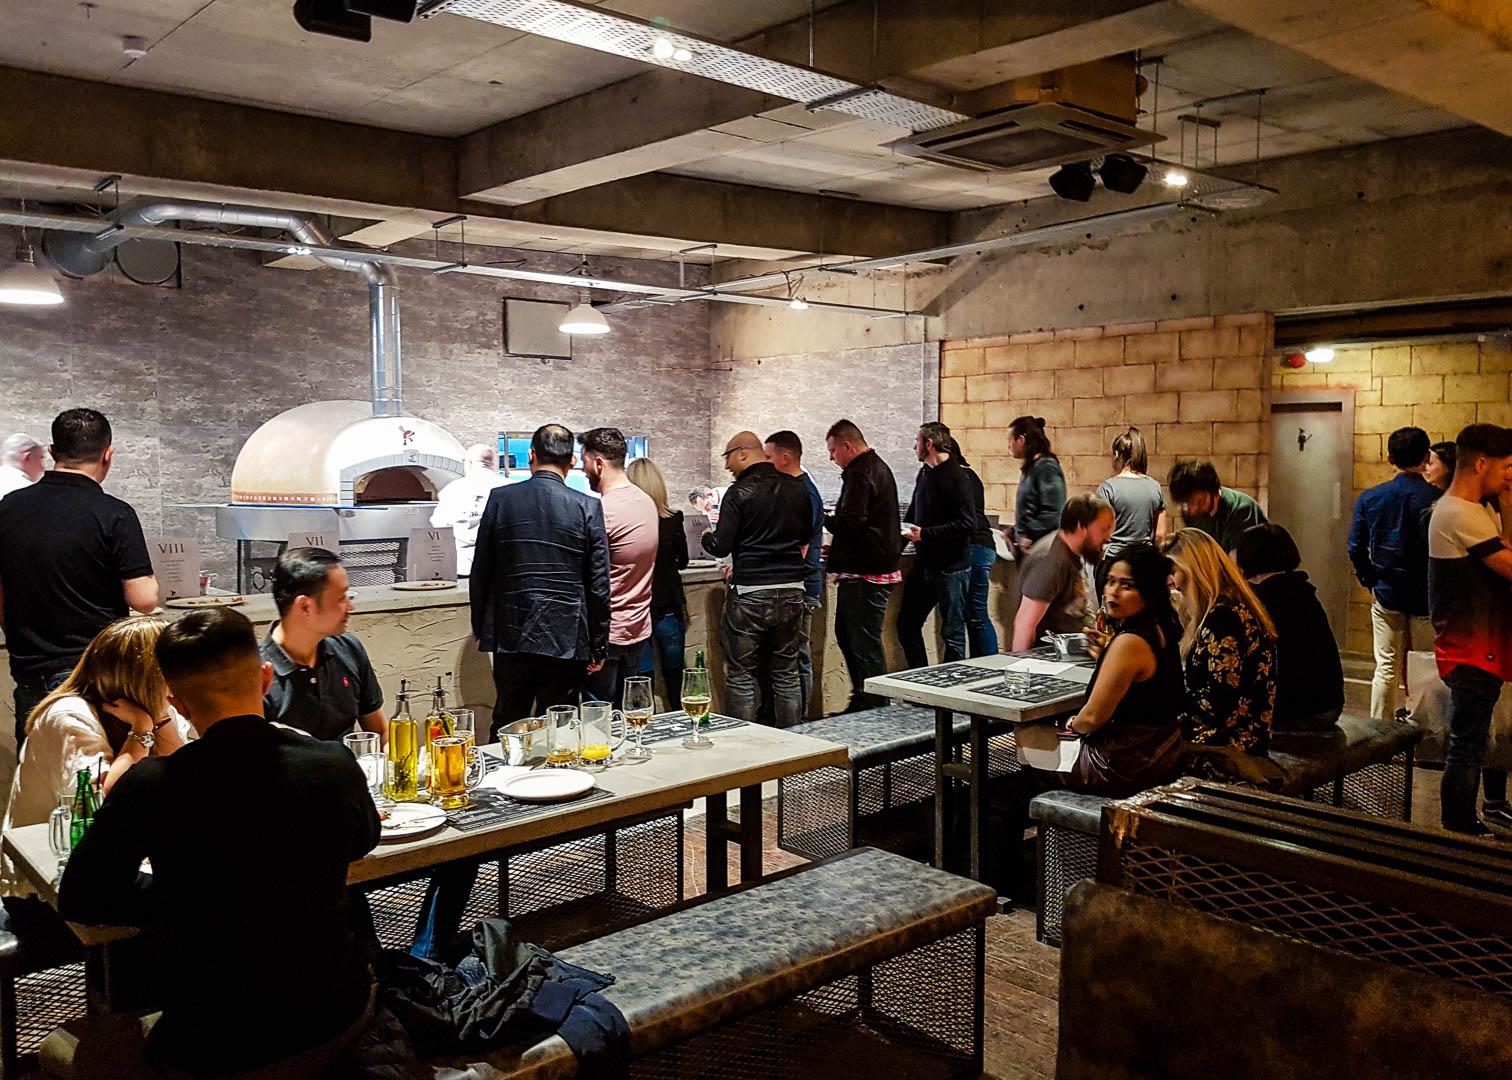 The open kitchen at the new vegan-friendly restaurant Romans Pizzeria Glasgow.